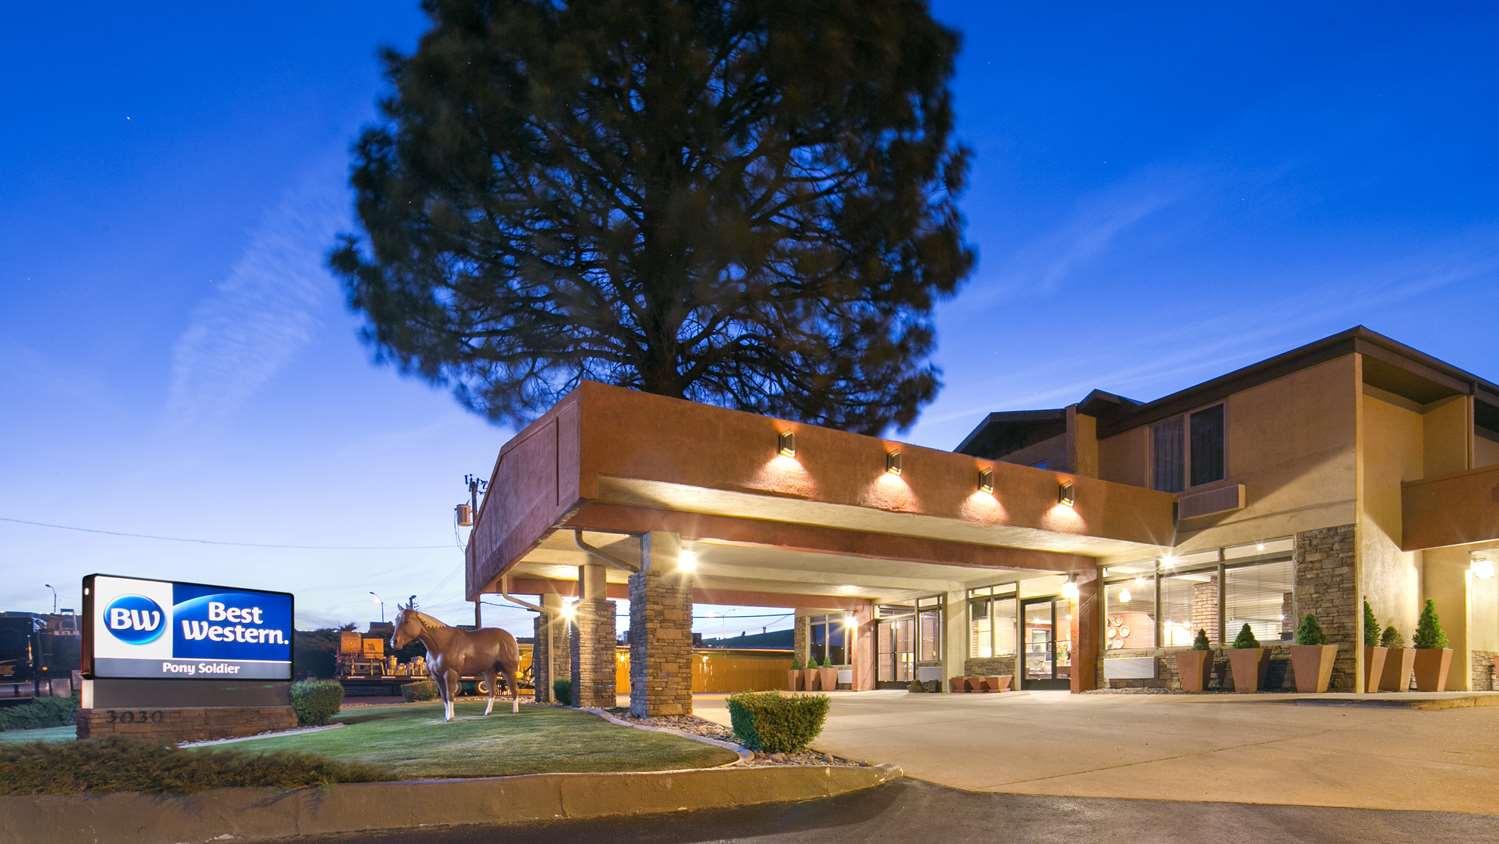 Exterior view - Best Western Pony Soldier Inn & Suites Flagstaff